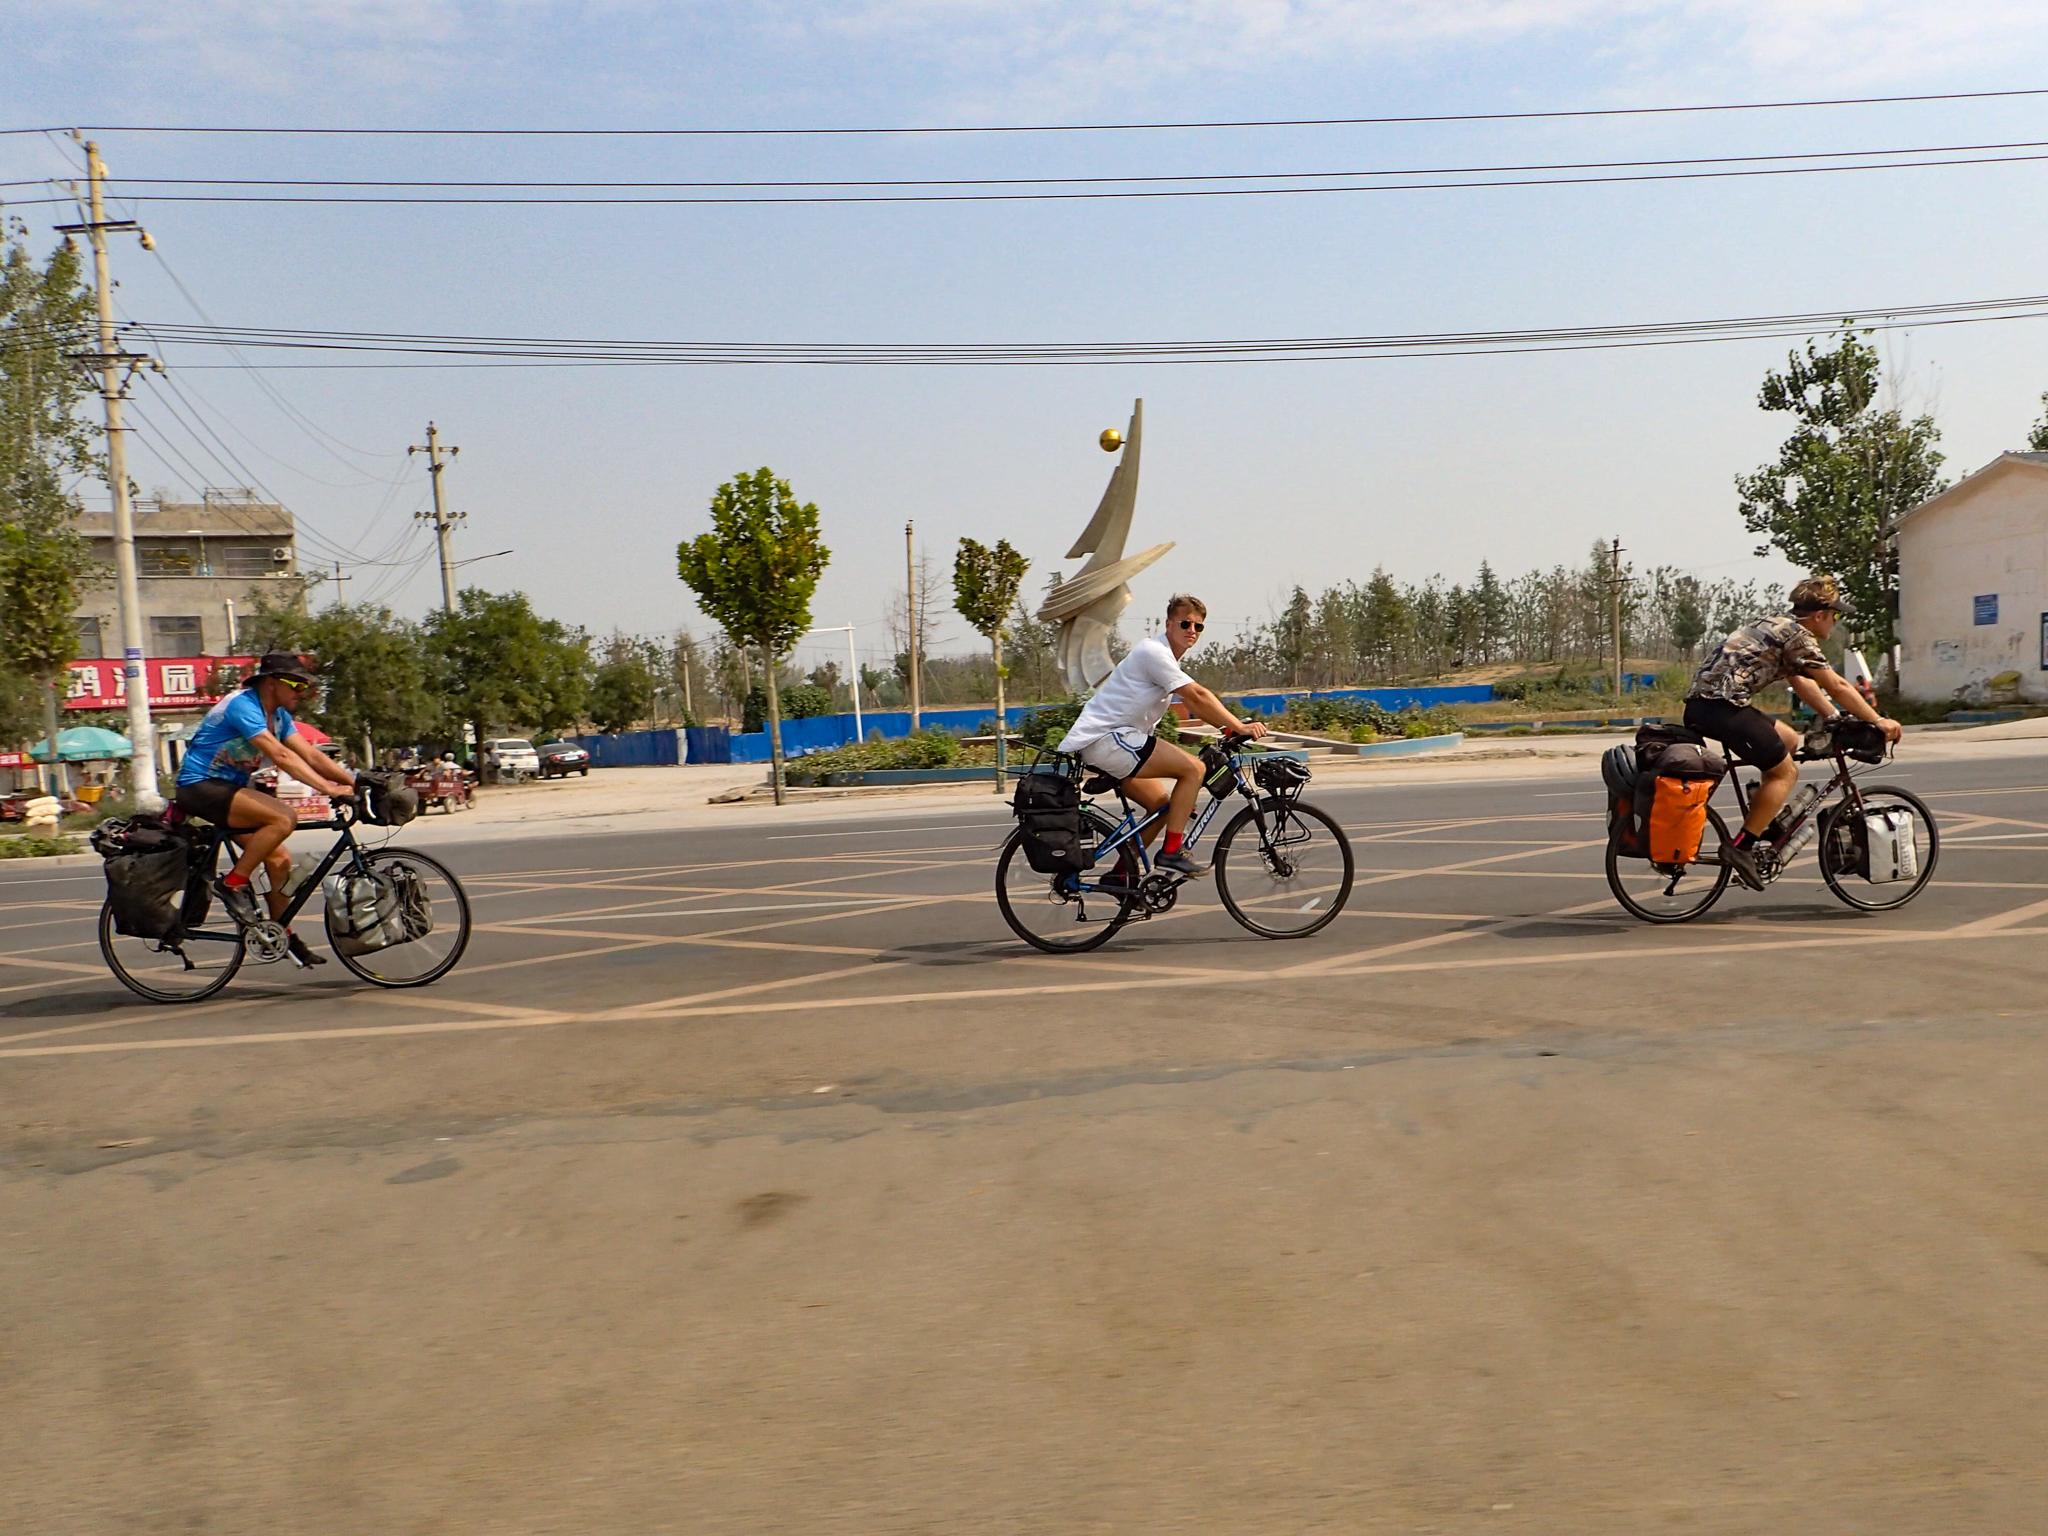 Three Amigos ride again